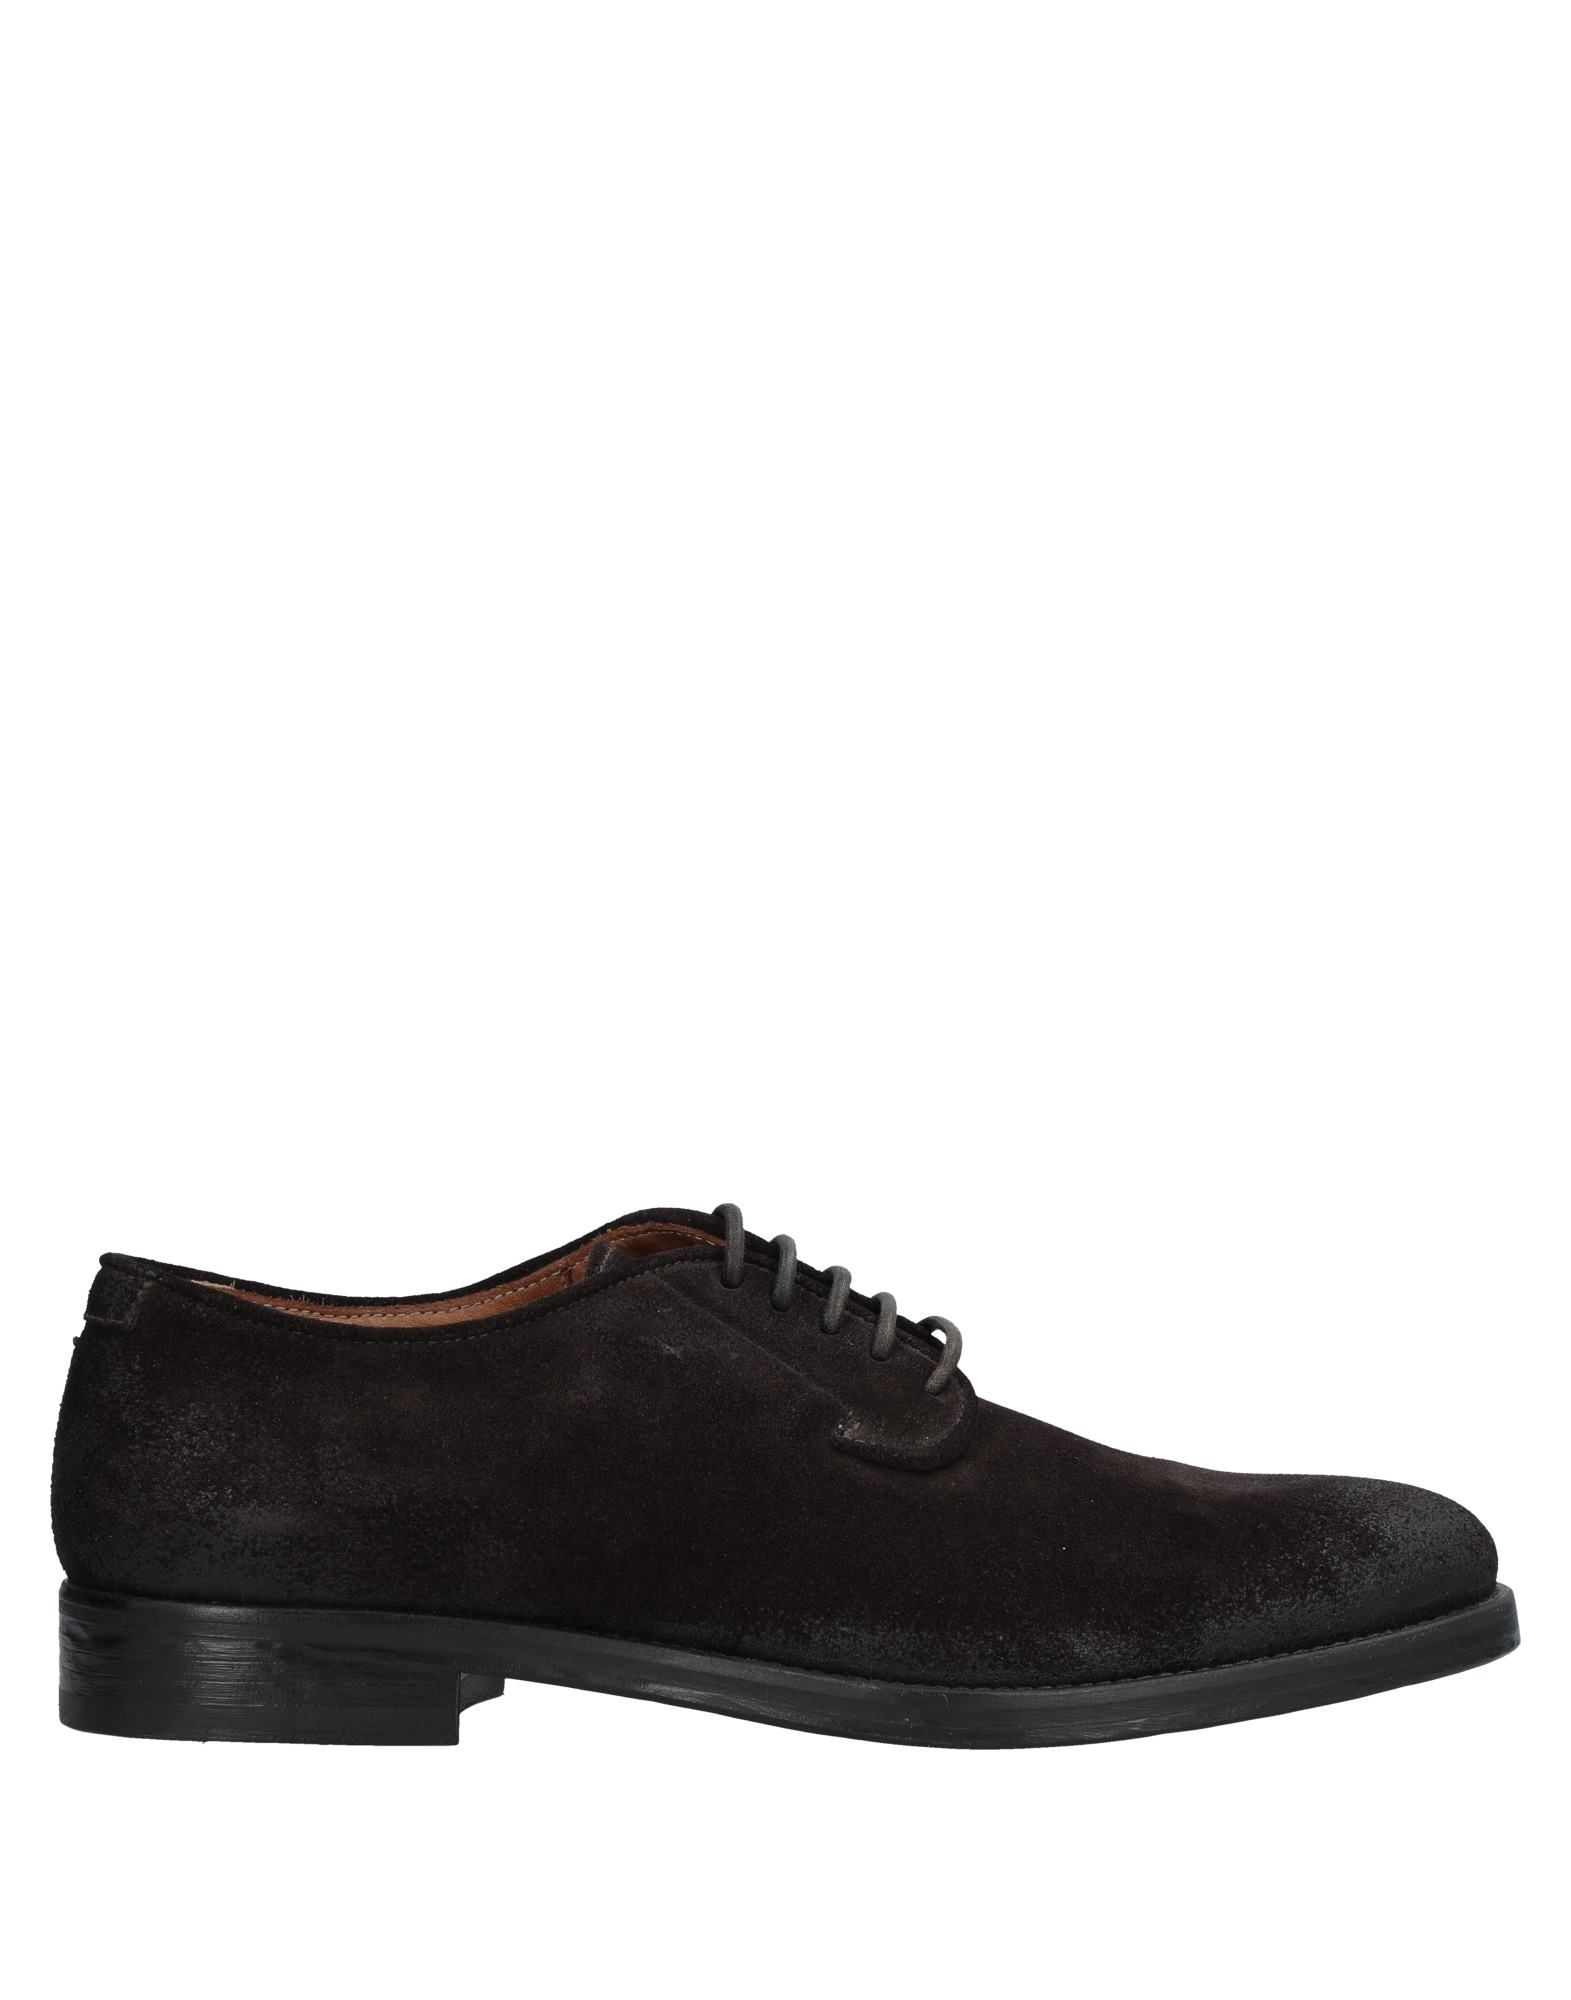 Haltbare Mode billige Schuhe Doucal's Schnürschuhe Herren  11530698OS Heiße Schuhe